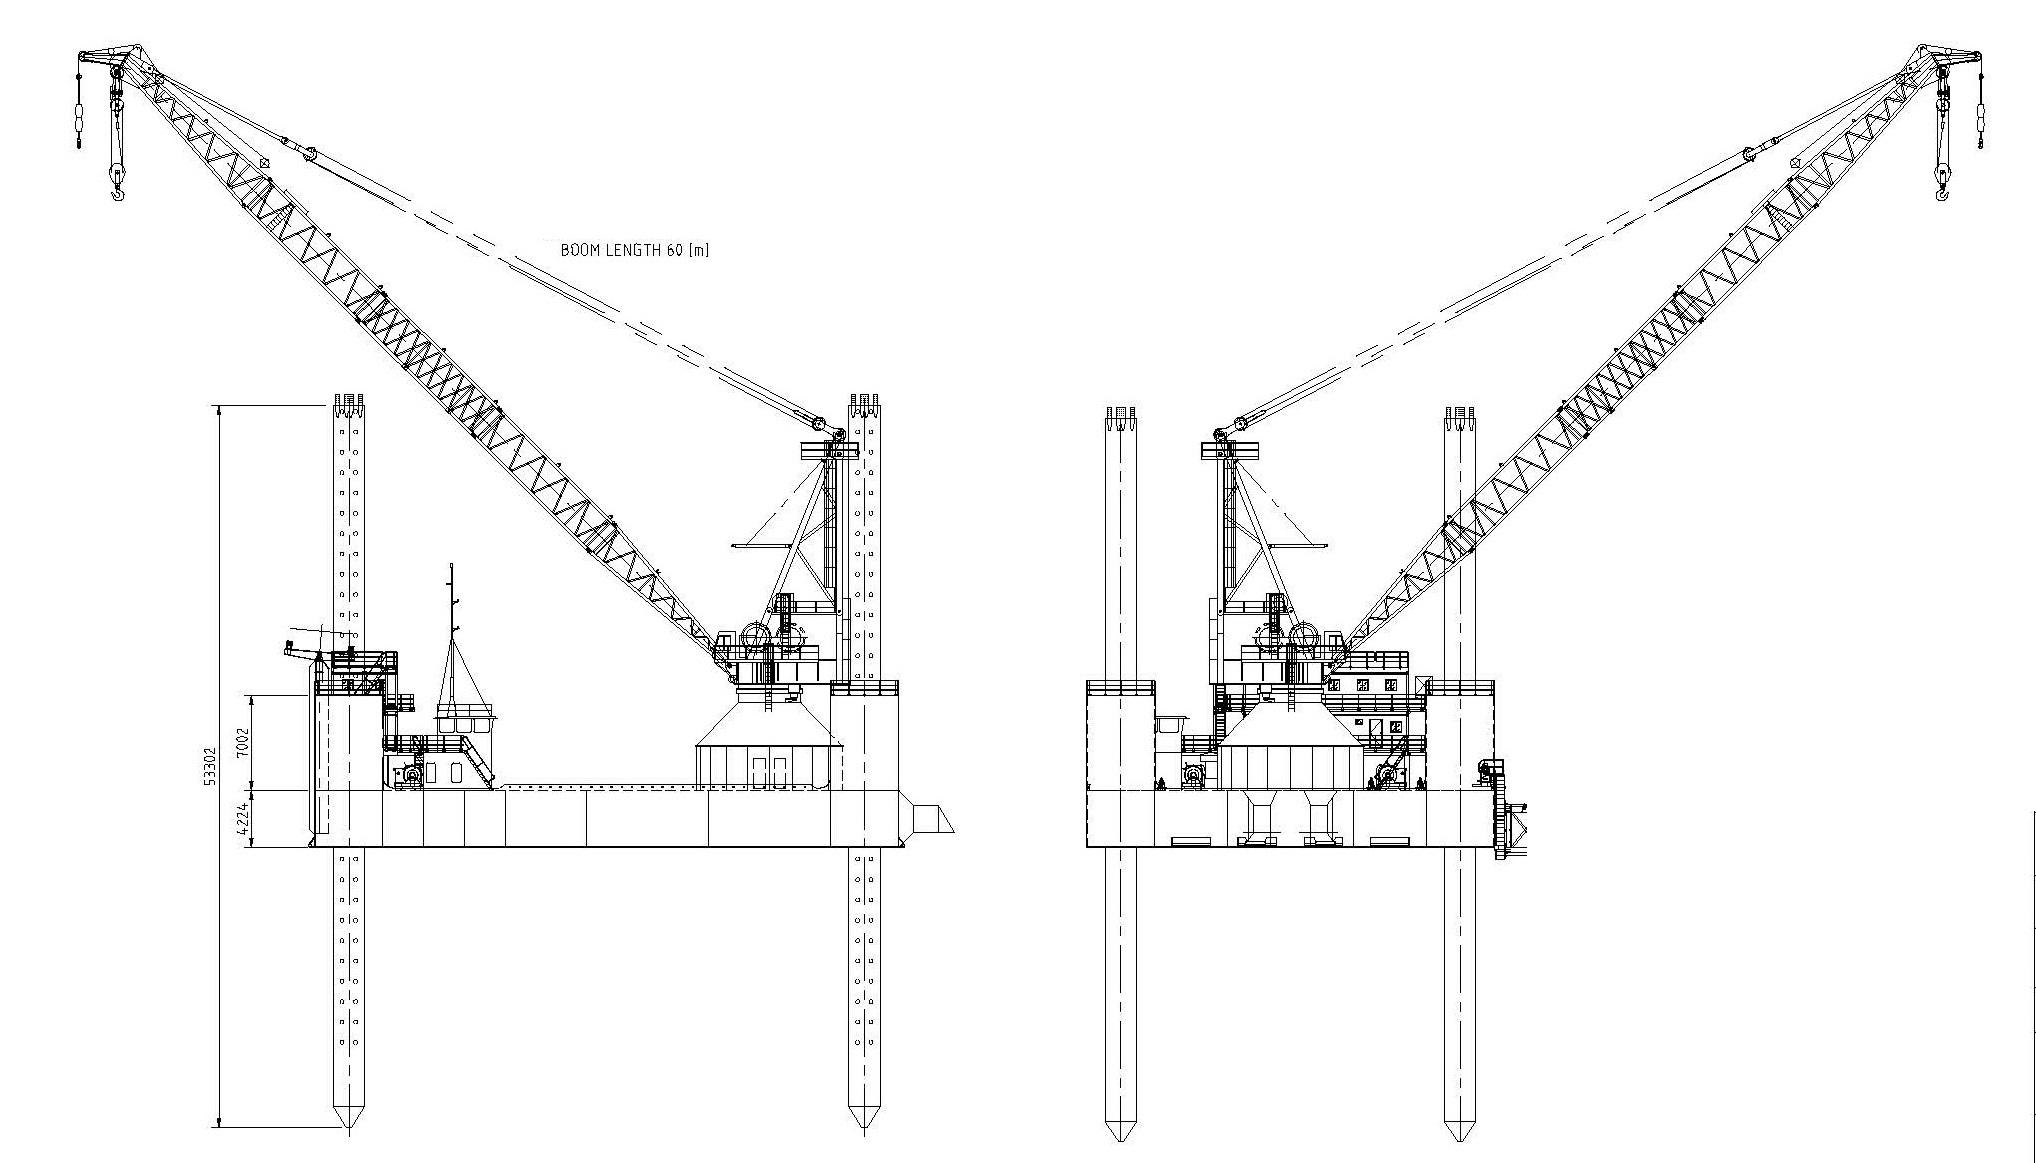 Jack-up Barge, 250 ton pedestal crane - Van Loon Maritime